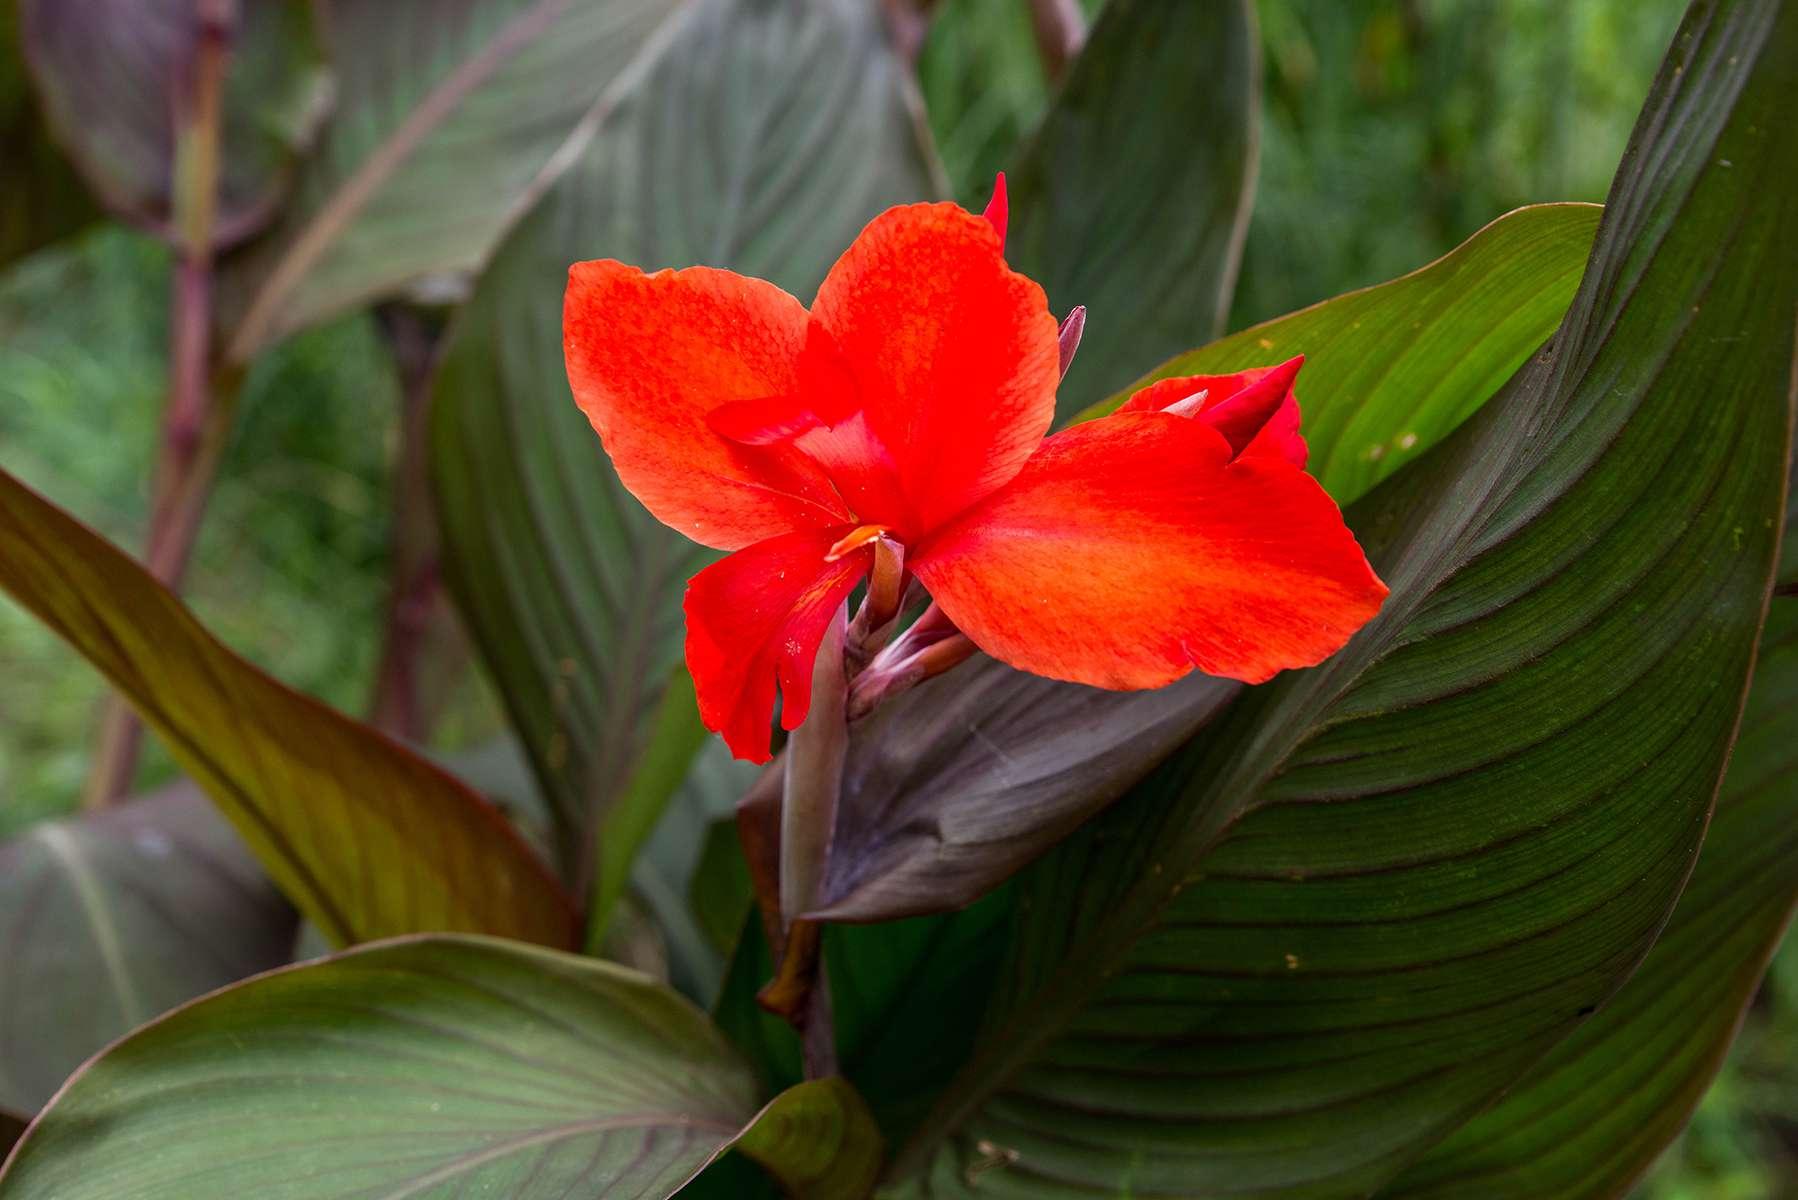 King Humbert canna lily